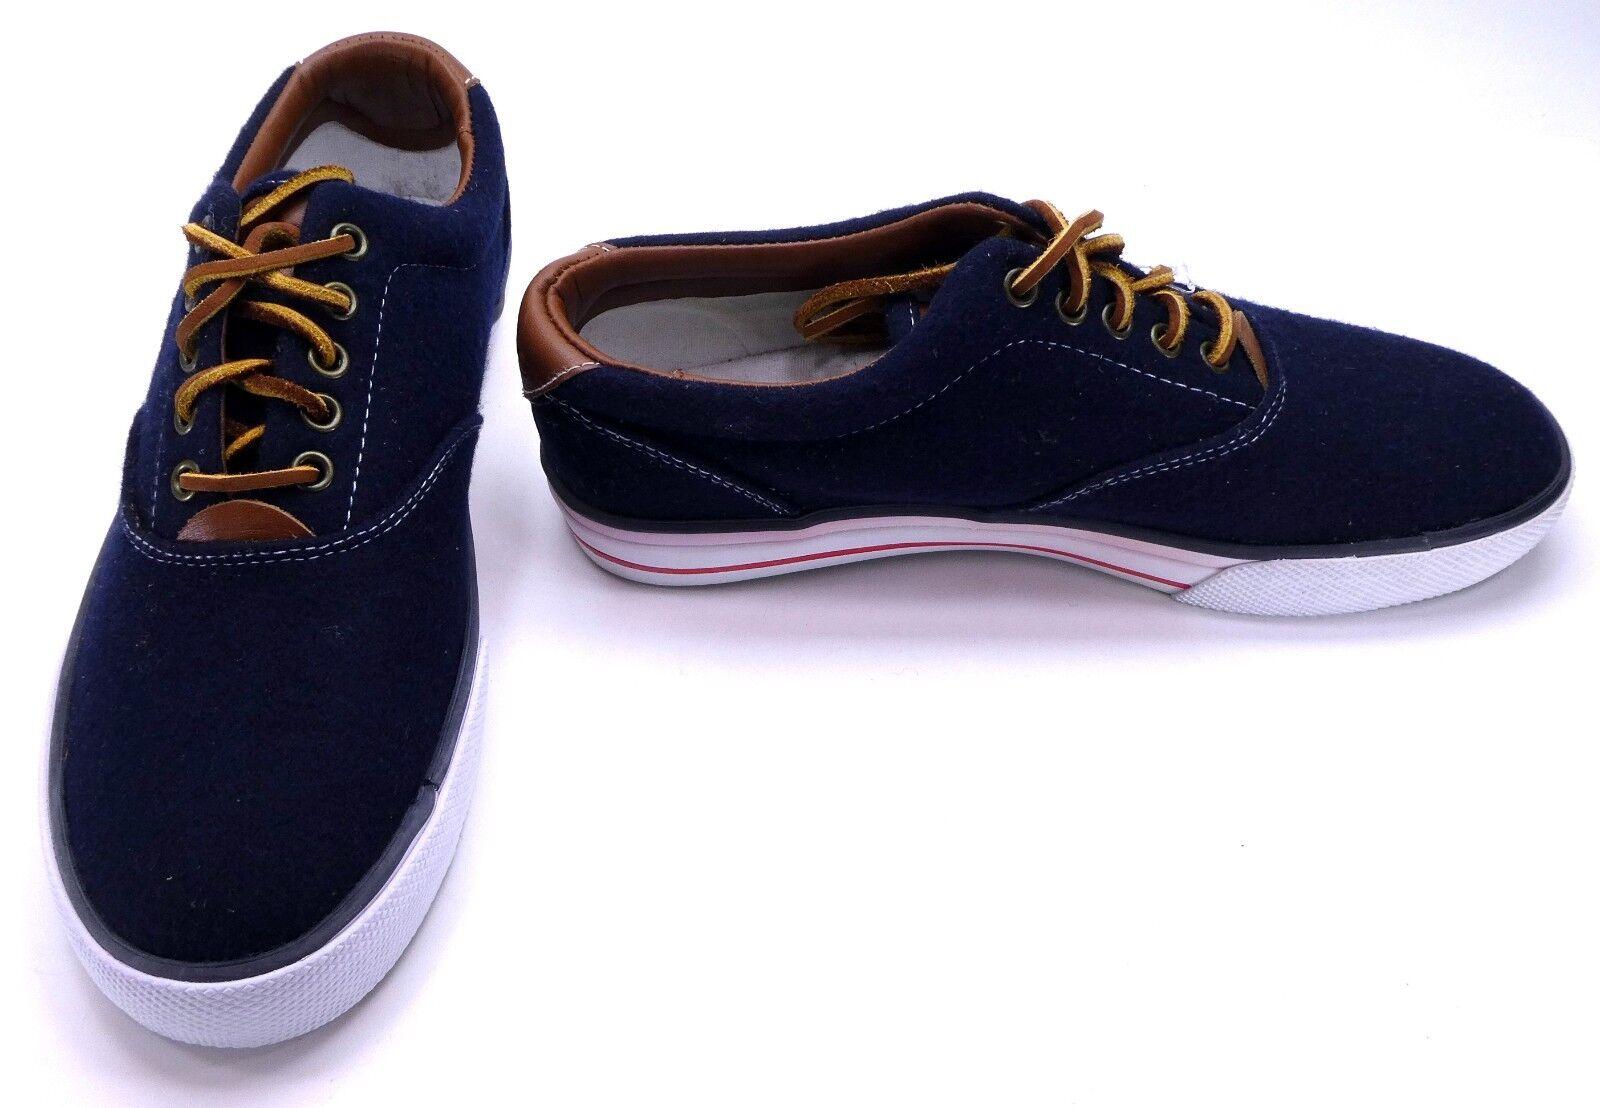 Polo Ralph Lauren Shoes Vaughn Athletic Flannel Blue Scarpe da Ginnastica Size 8.5